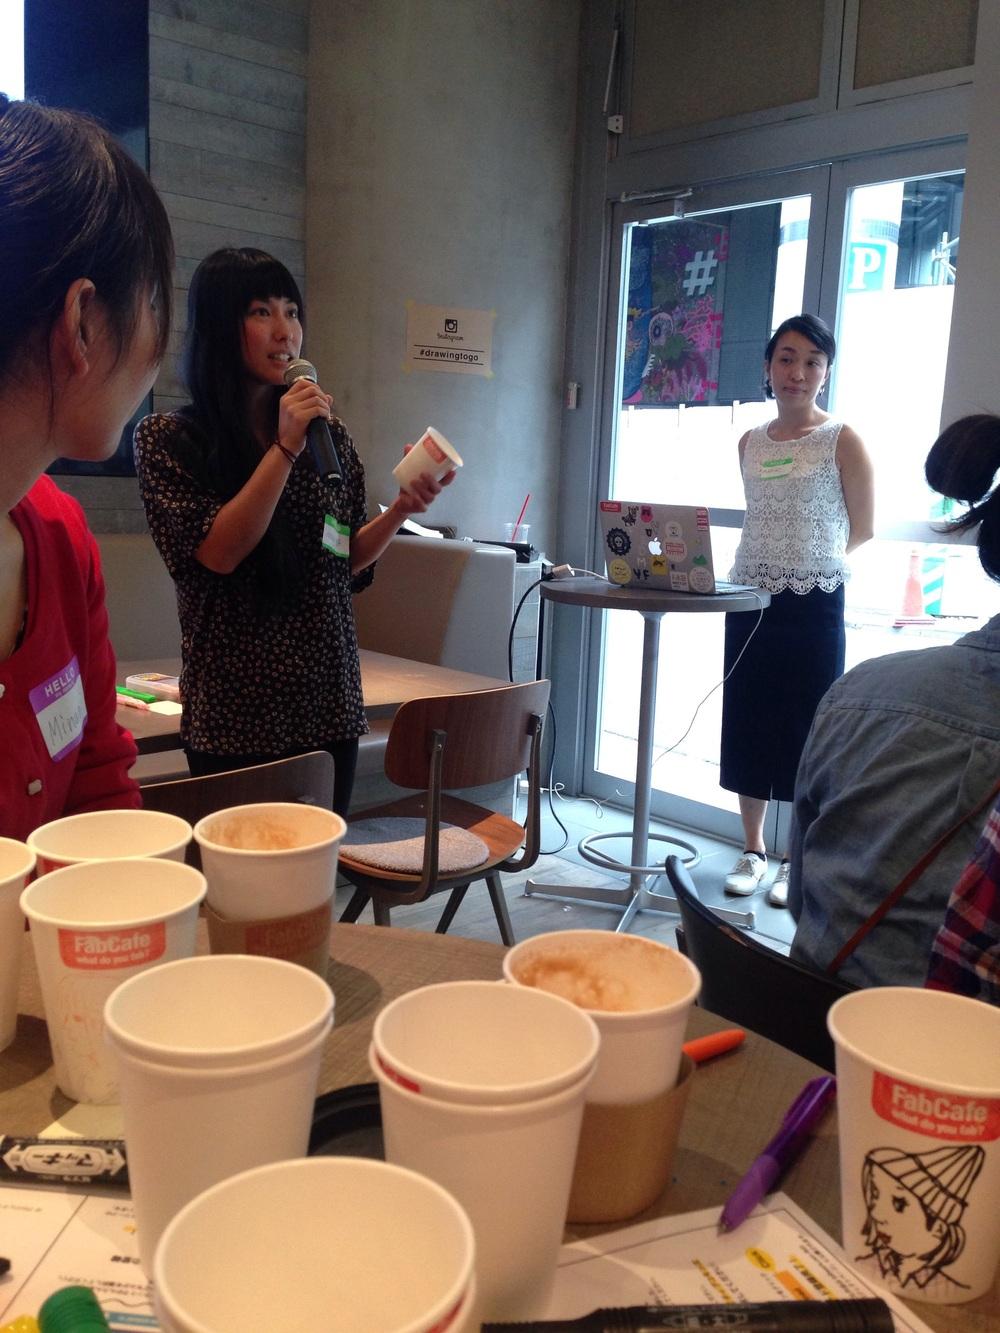 Mariya Suzuki on how she started drawing on coffee cups.